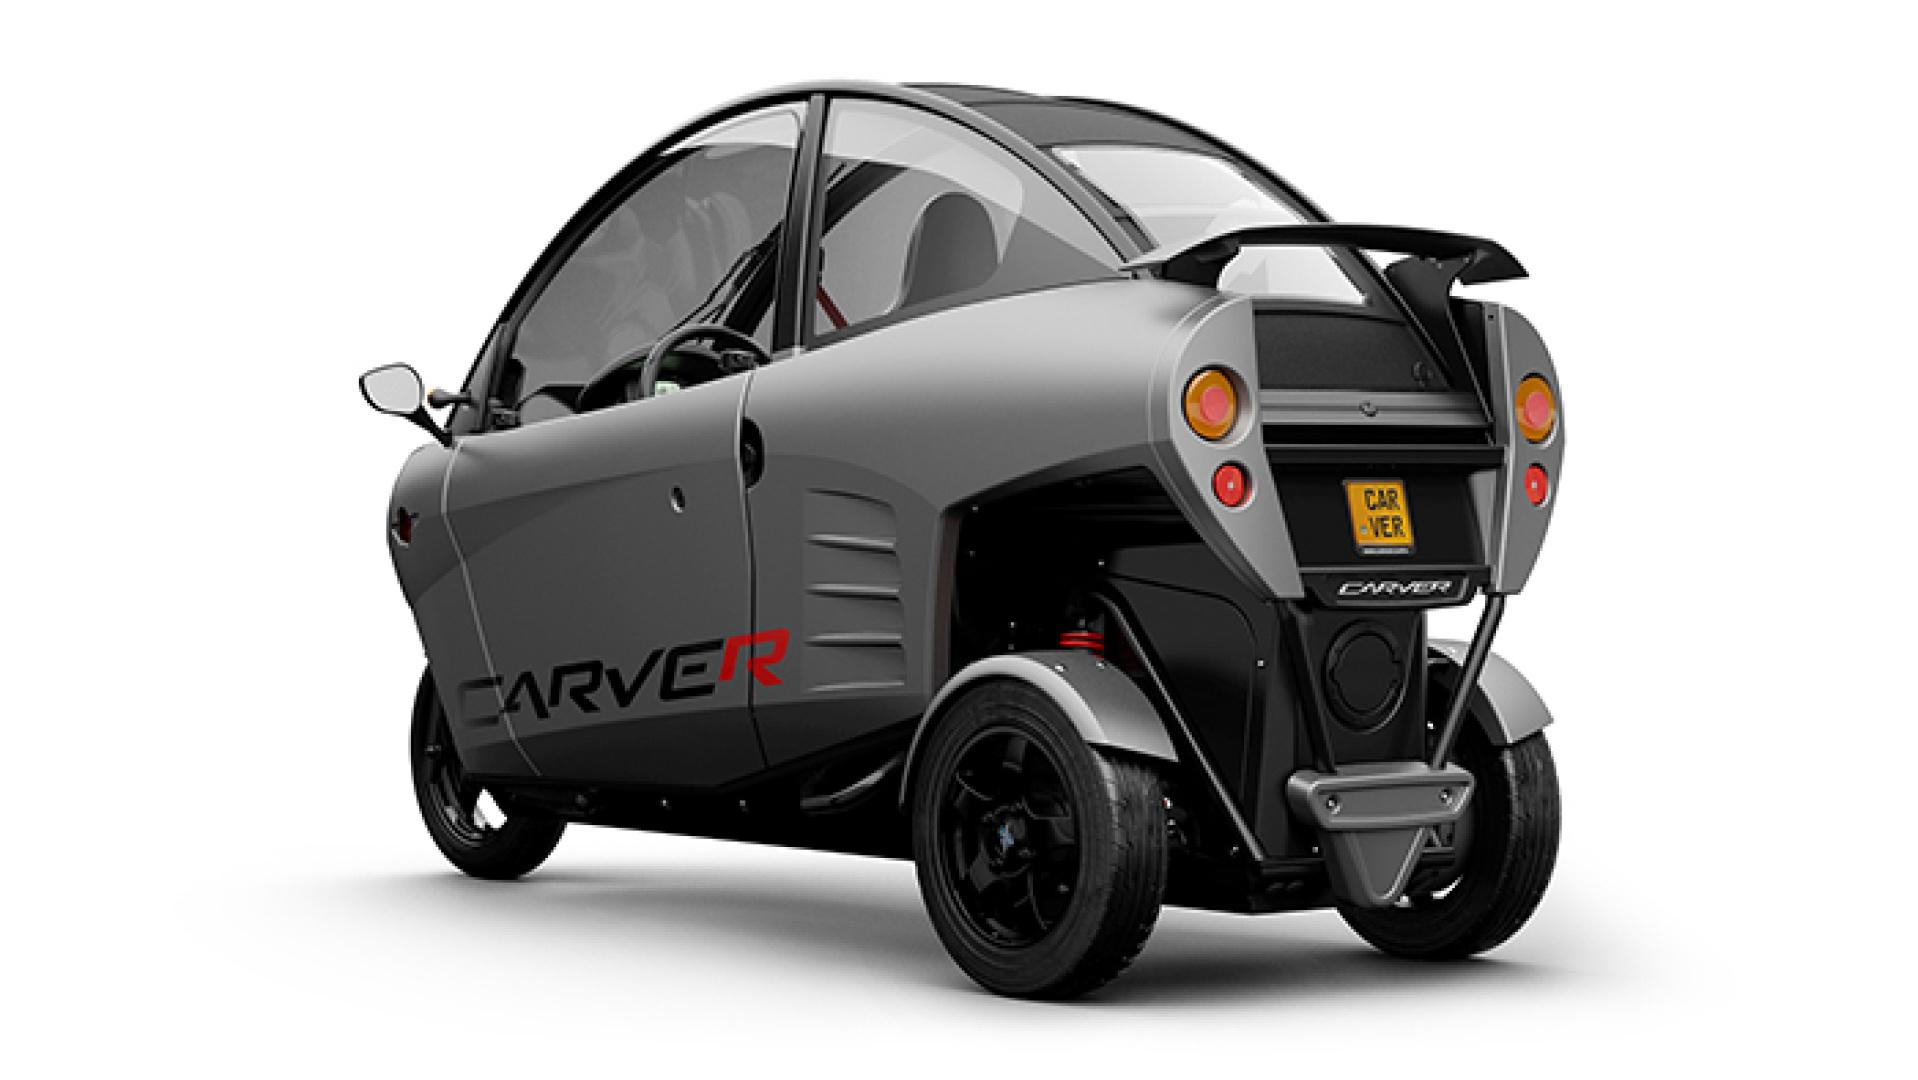 Carver-Carver Sport-0